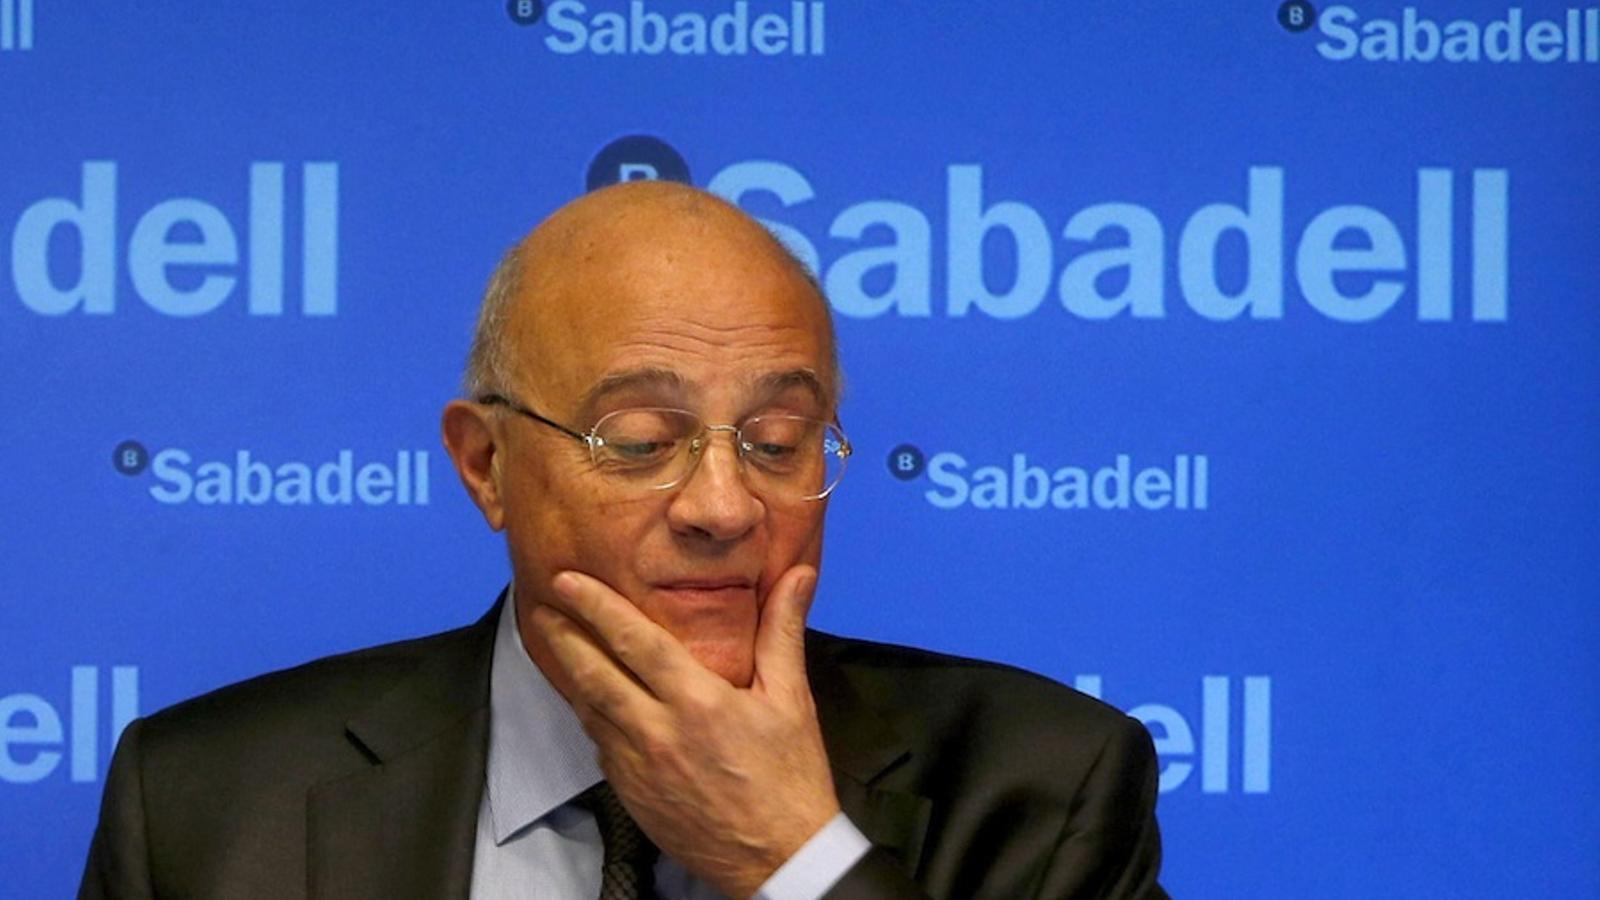 Banc sabadell planteja als sindicats un expedient temporal for Banc sabadell oficines sabadell